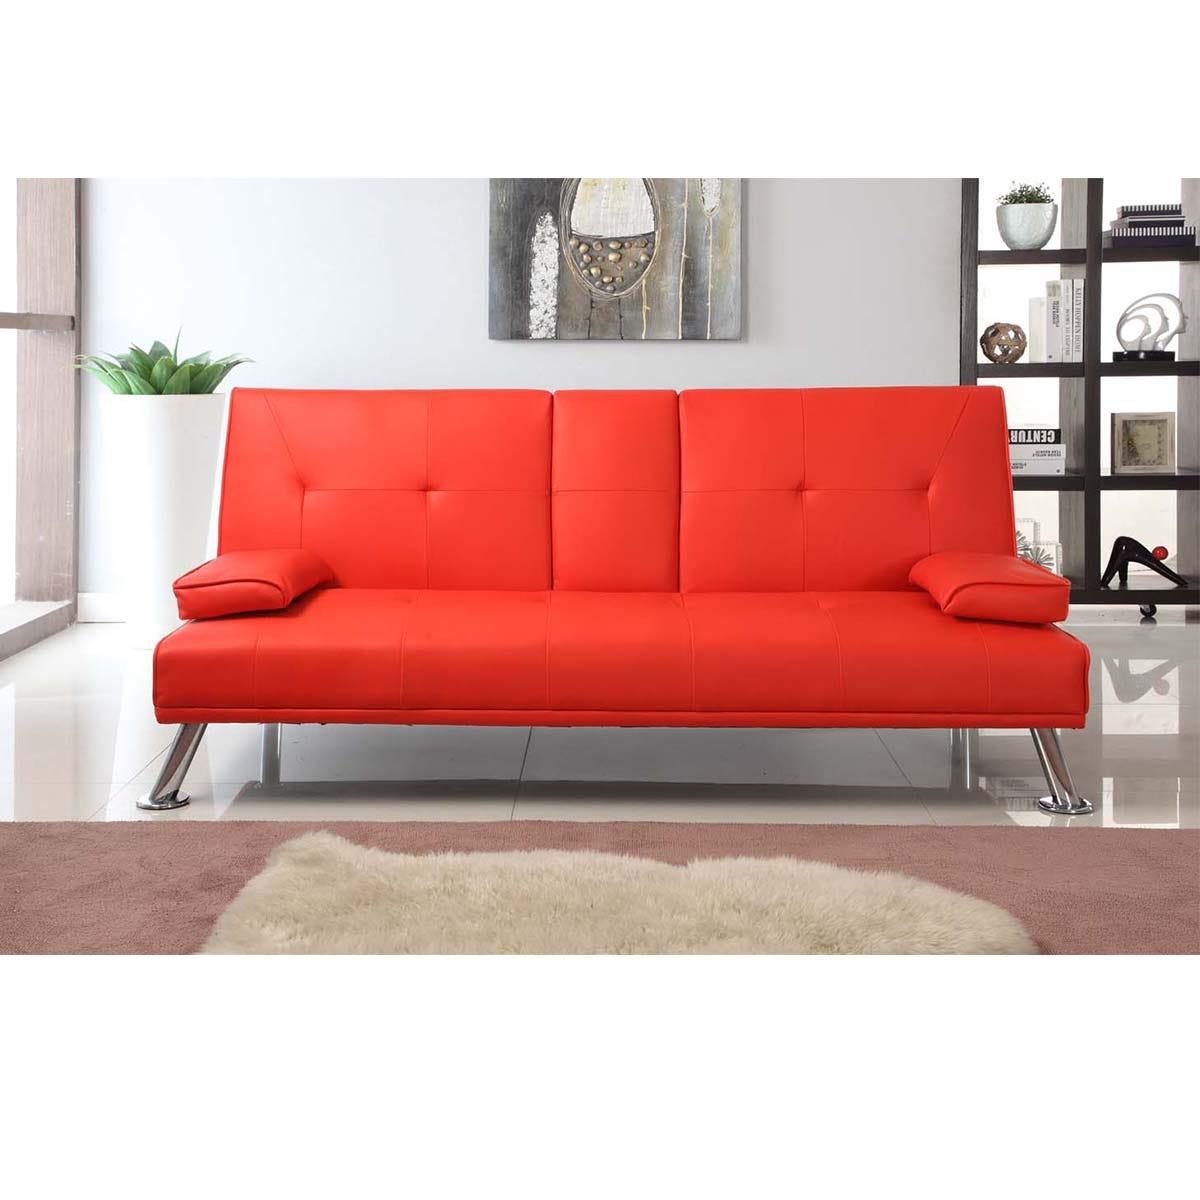 Yamba Sofa Bed - Red